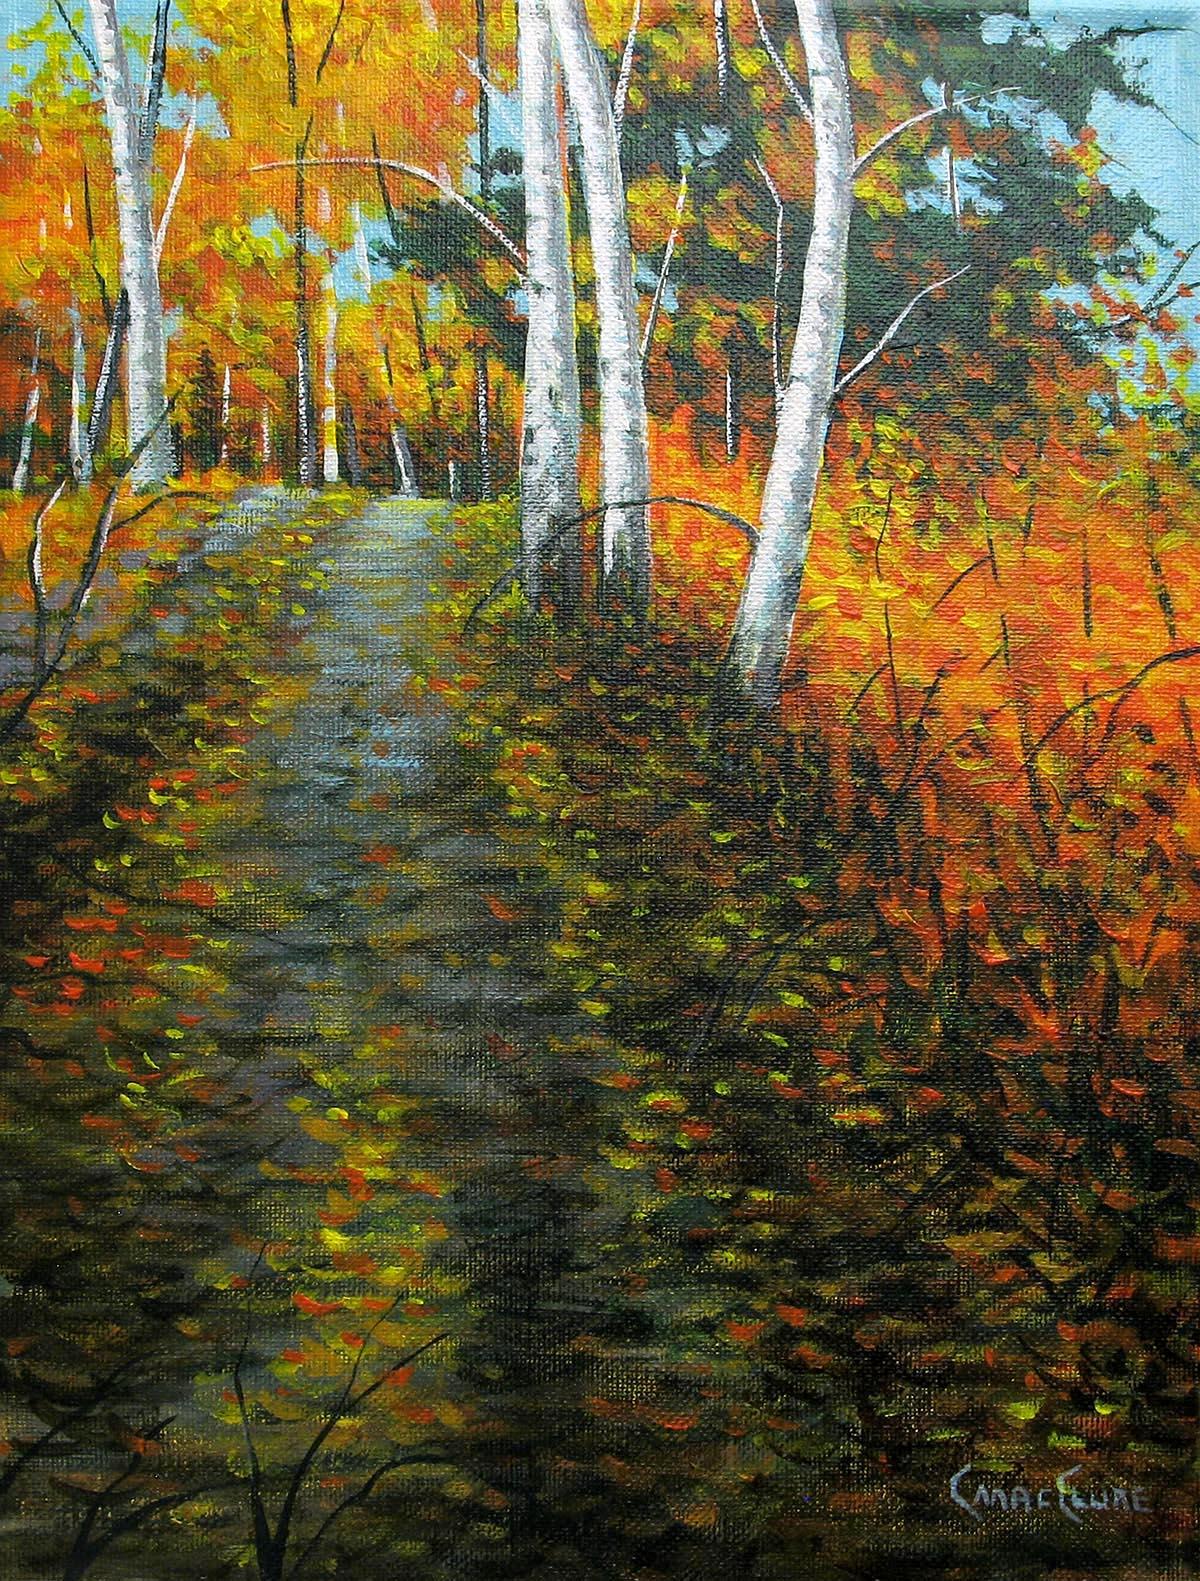 Along the Path - Chris MacClure